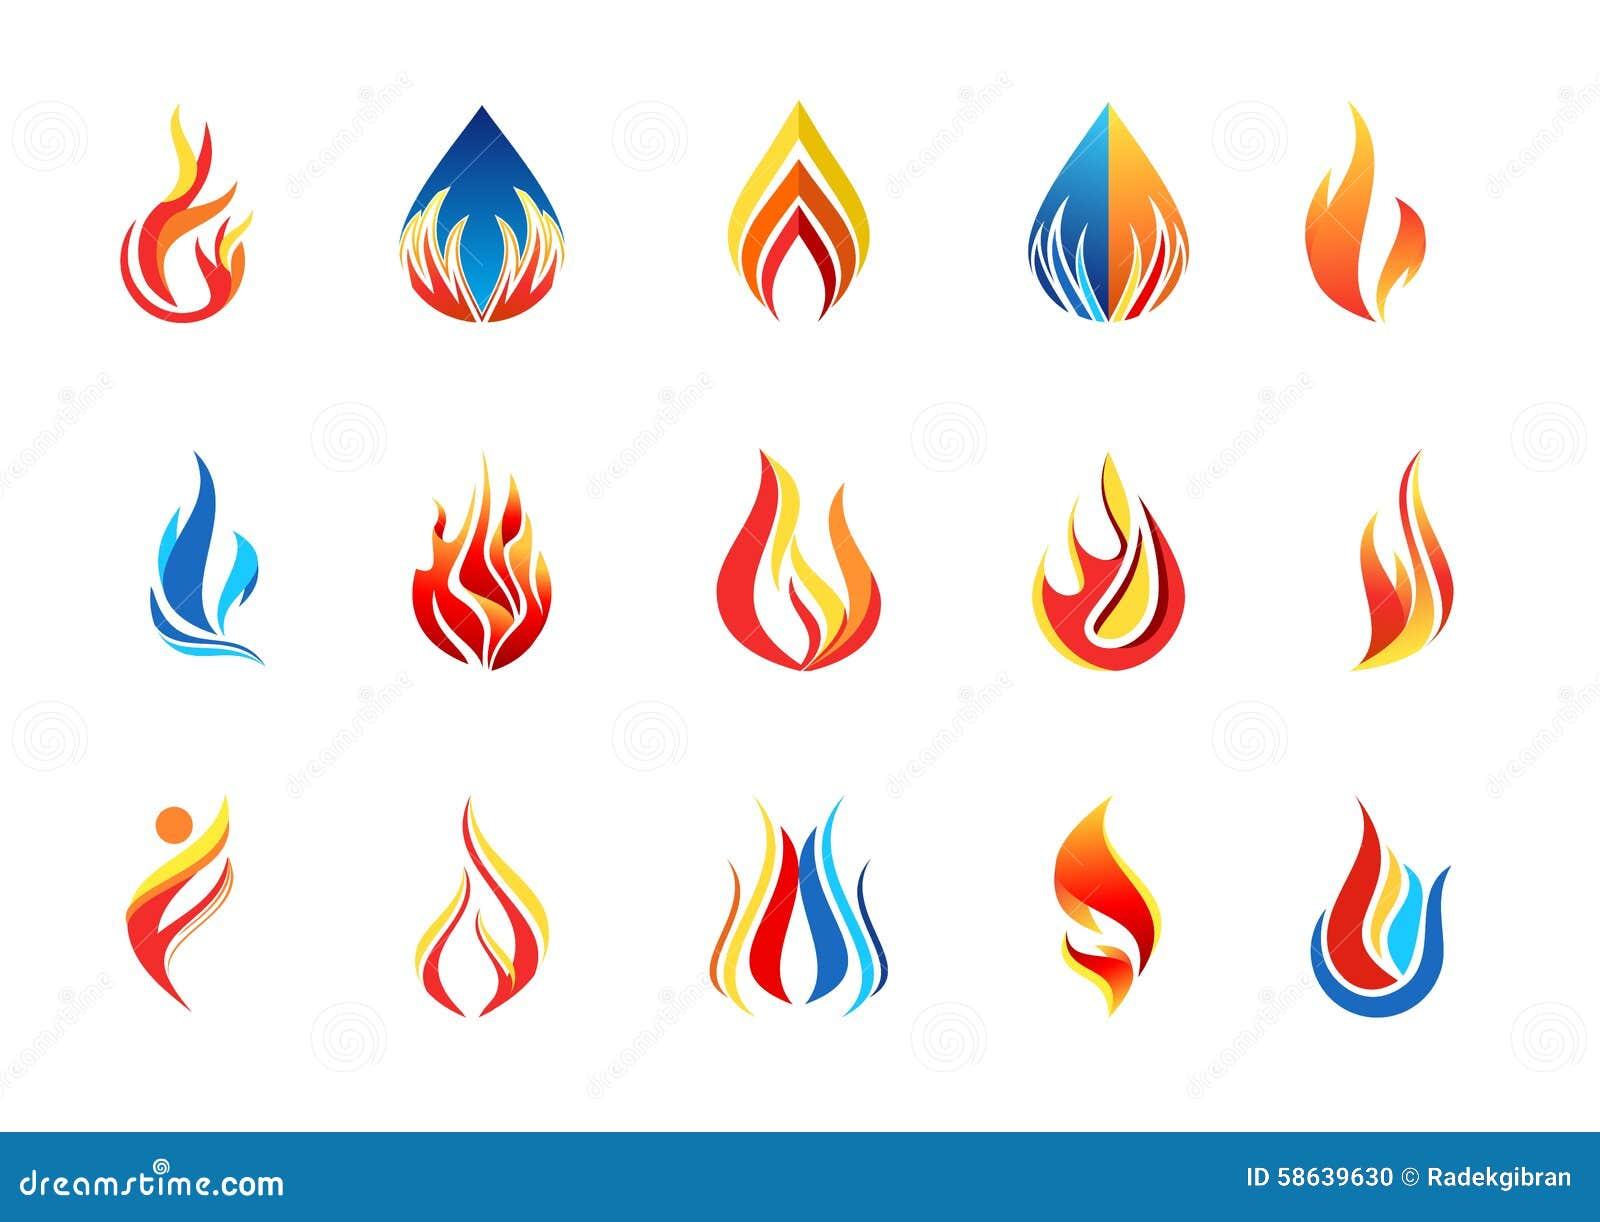 fire flame logo, modern flames collection logotype symbol icon design vector